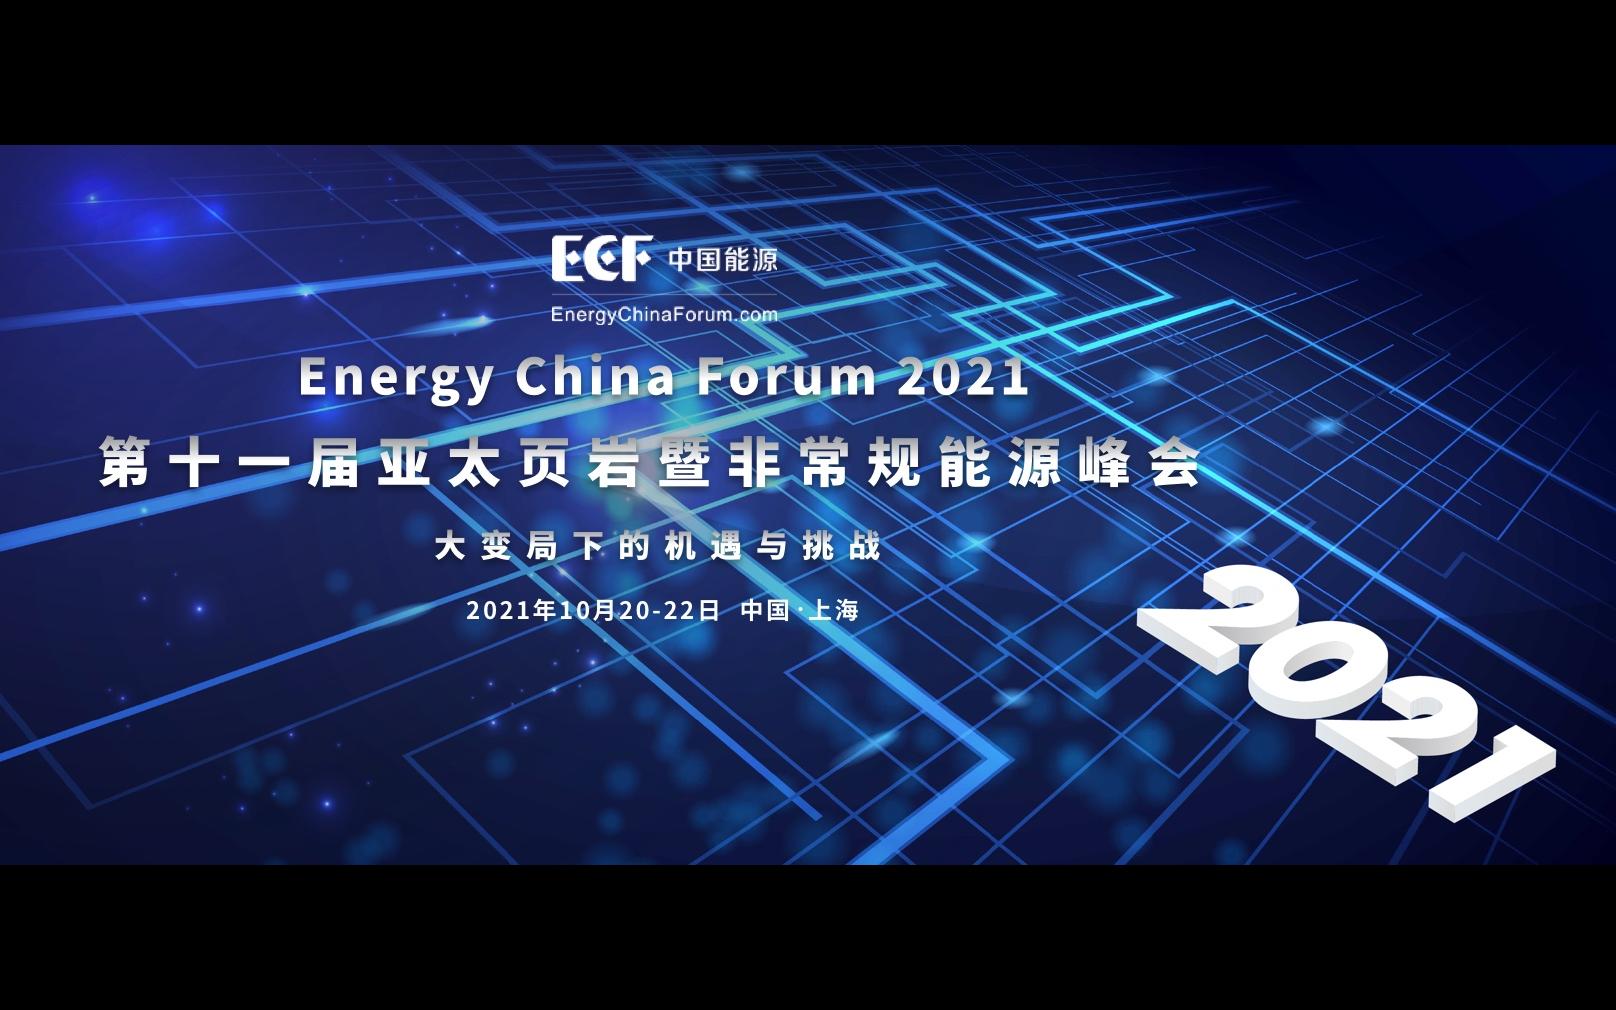 ECF国际页岩气论坛2021 第十一届亚太页岩油气暨非常规能源峰会